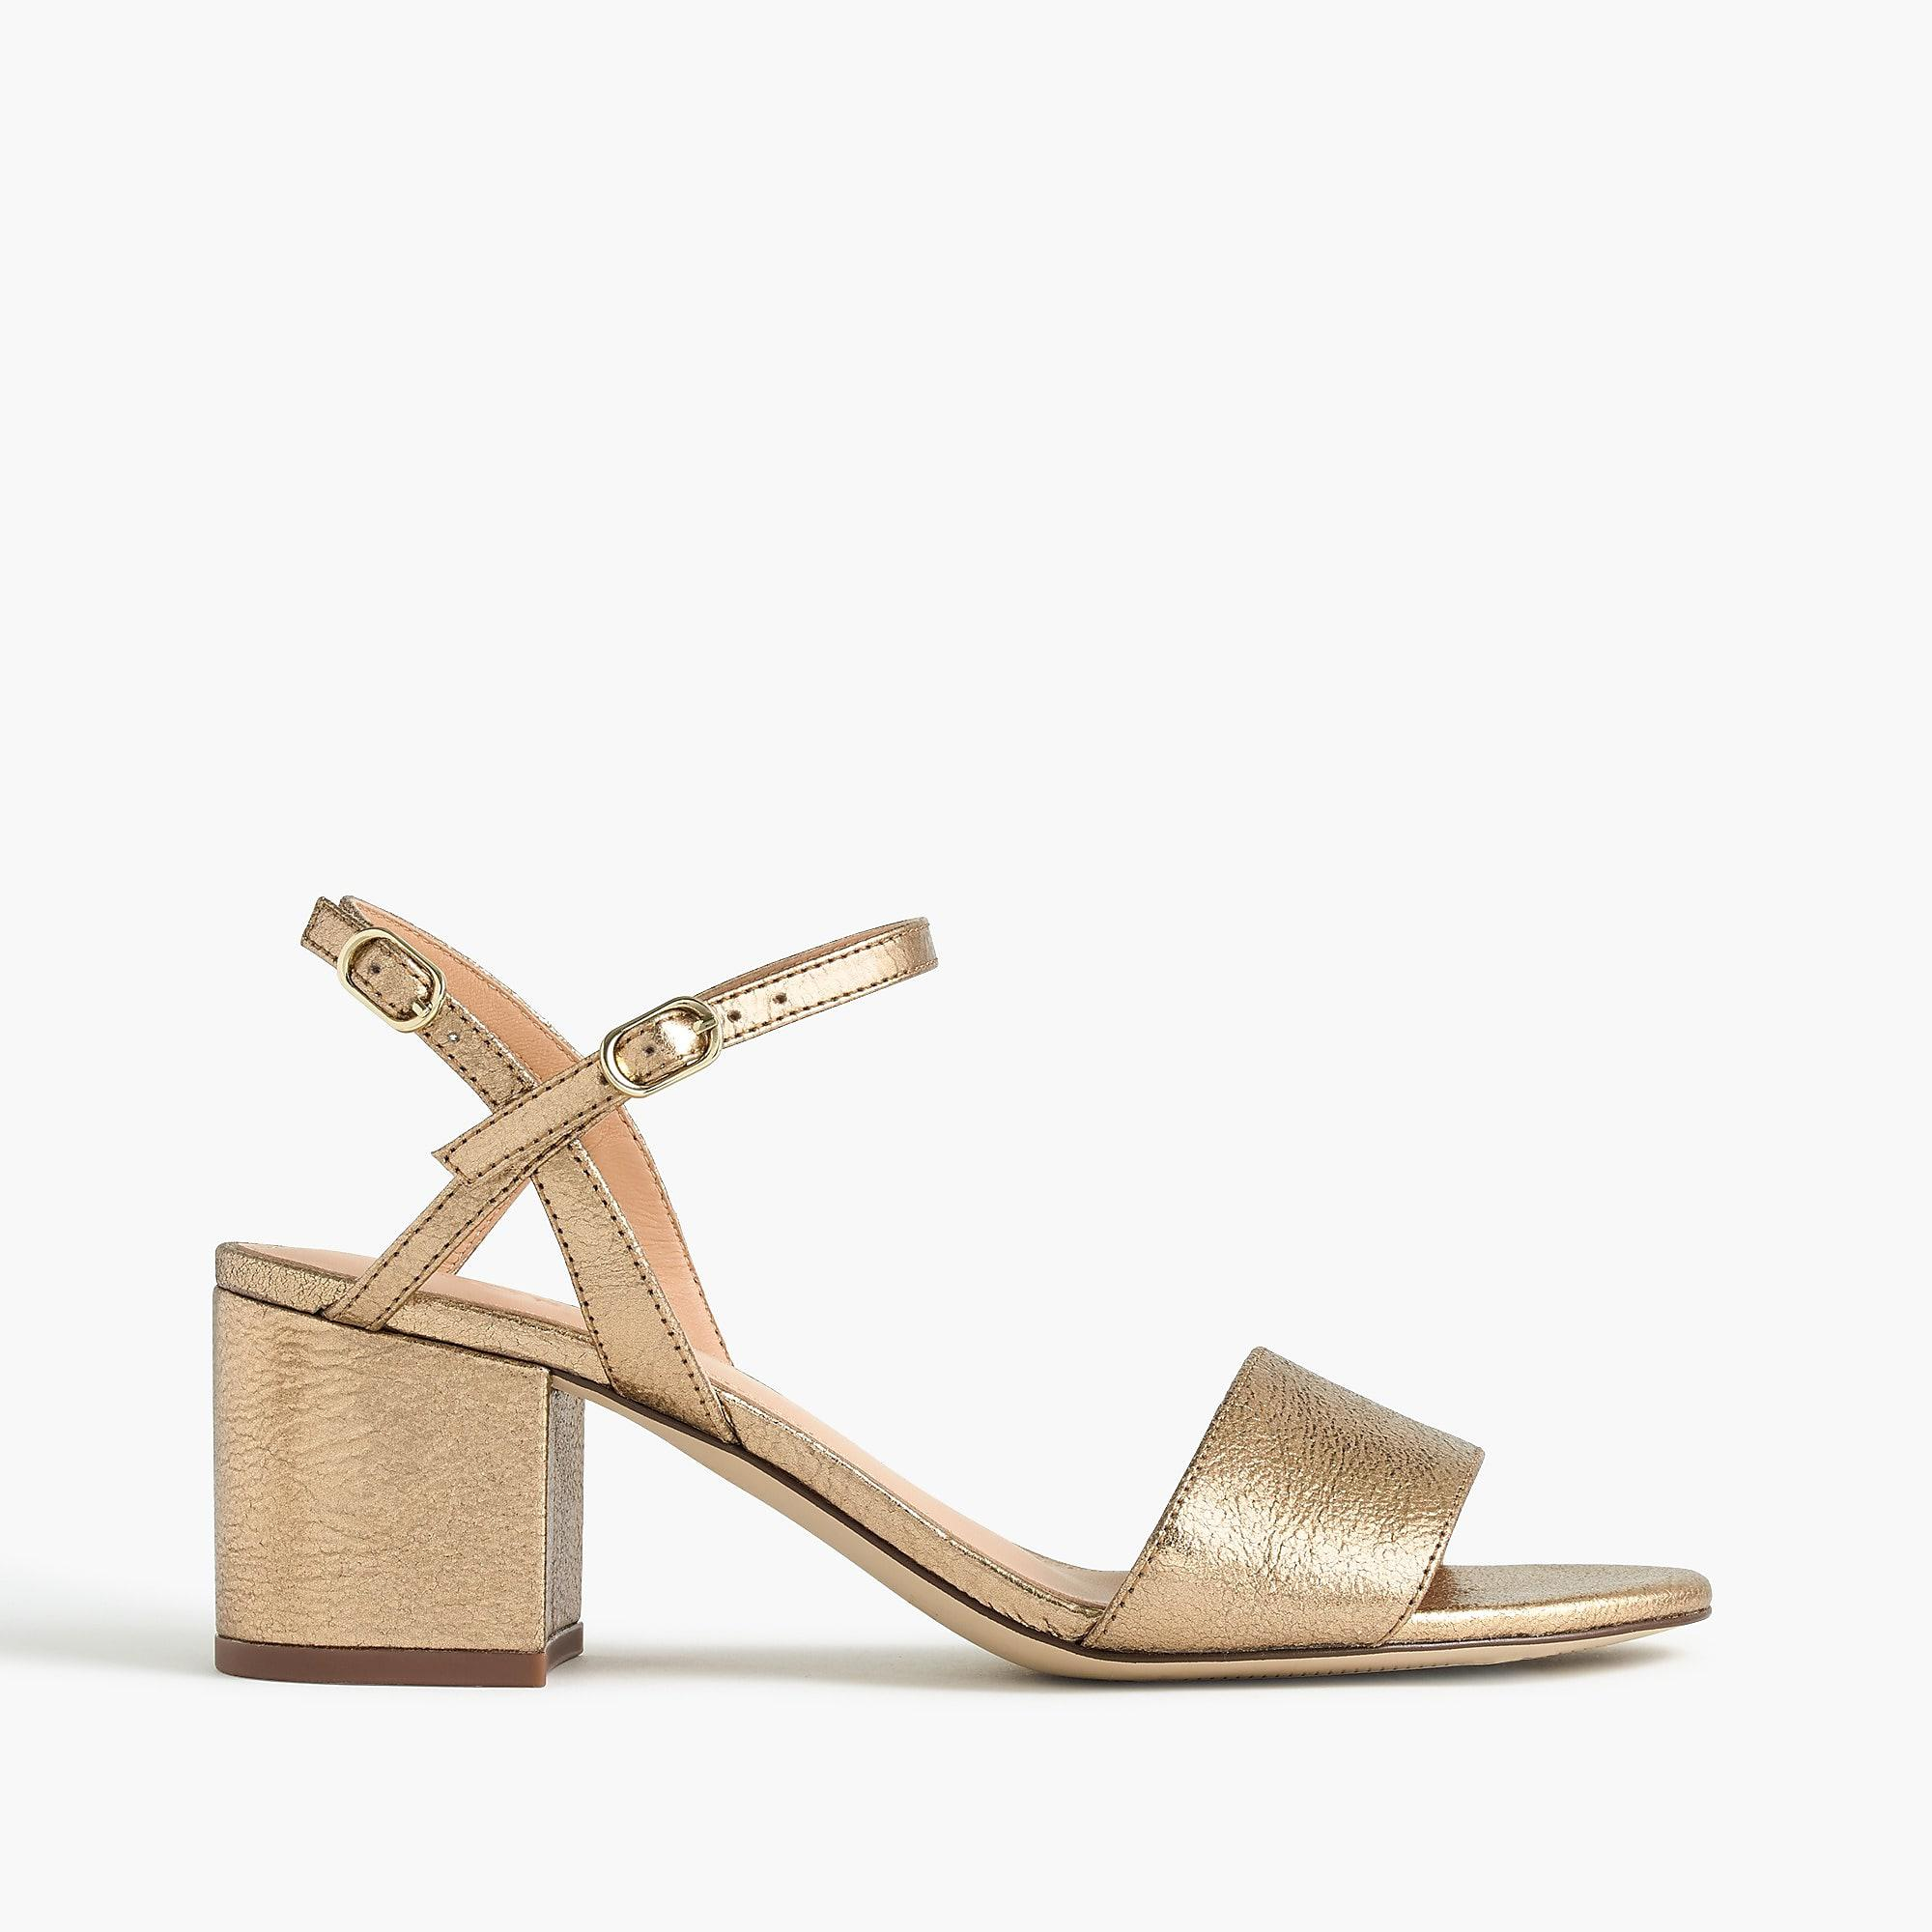 1913aa62903 J.Crew Strappy Block-heel Sandals (60mm) In Metallic Gold Leather in ...